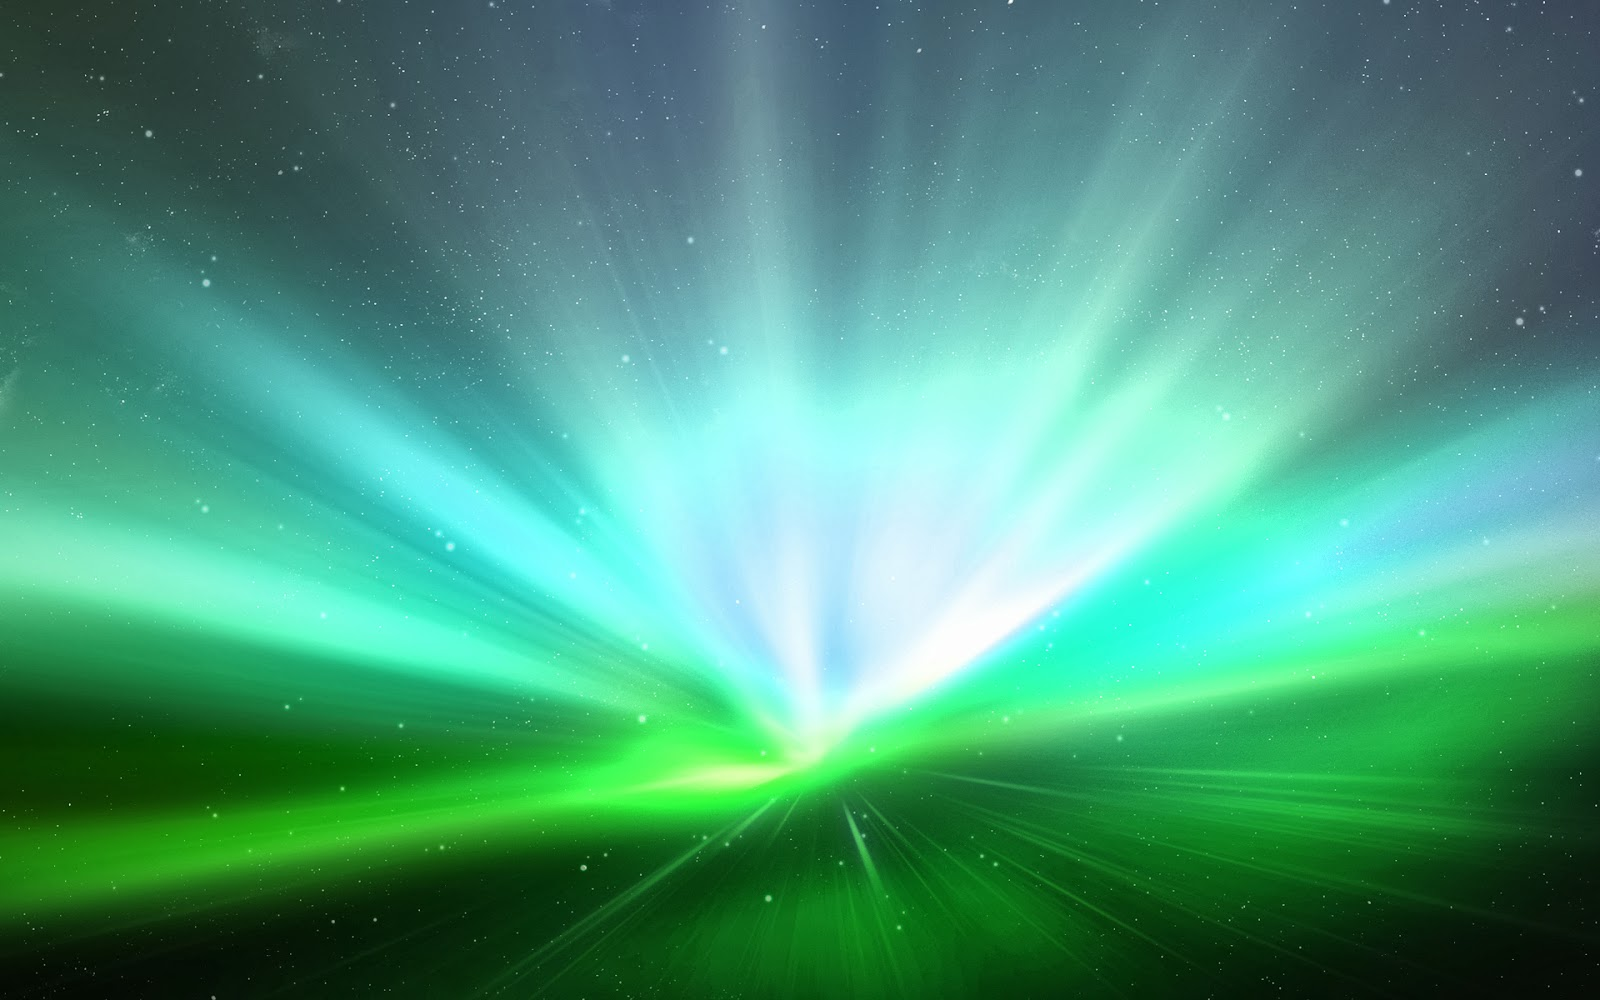 Hd Wallpapers Blog Green Aurora Hd Wallpapers 1600x1000